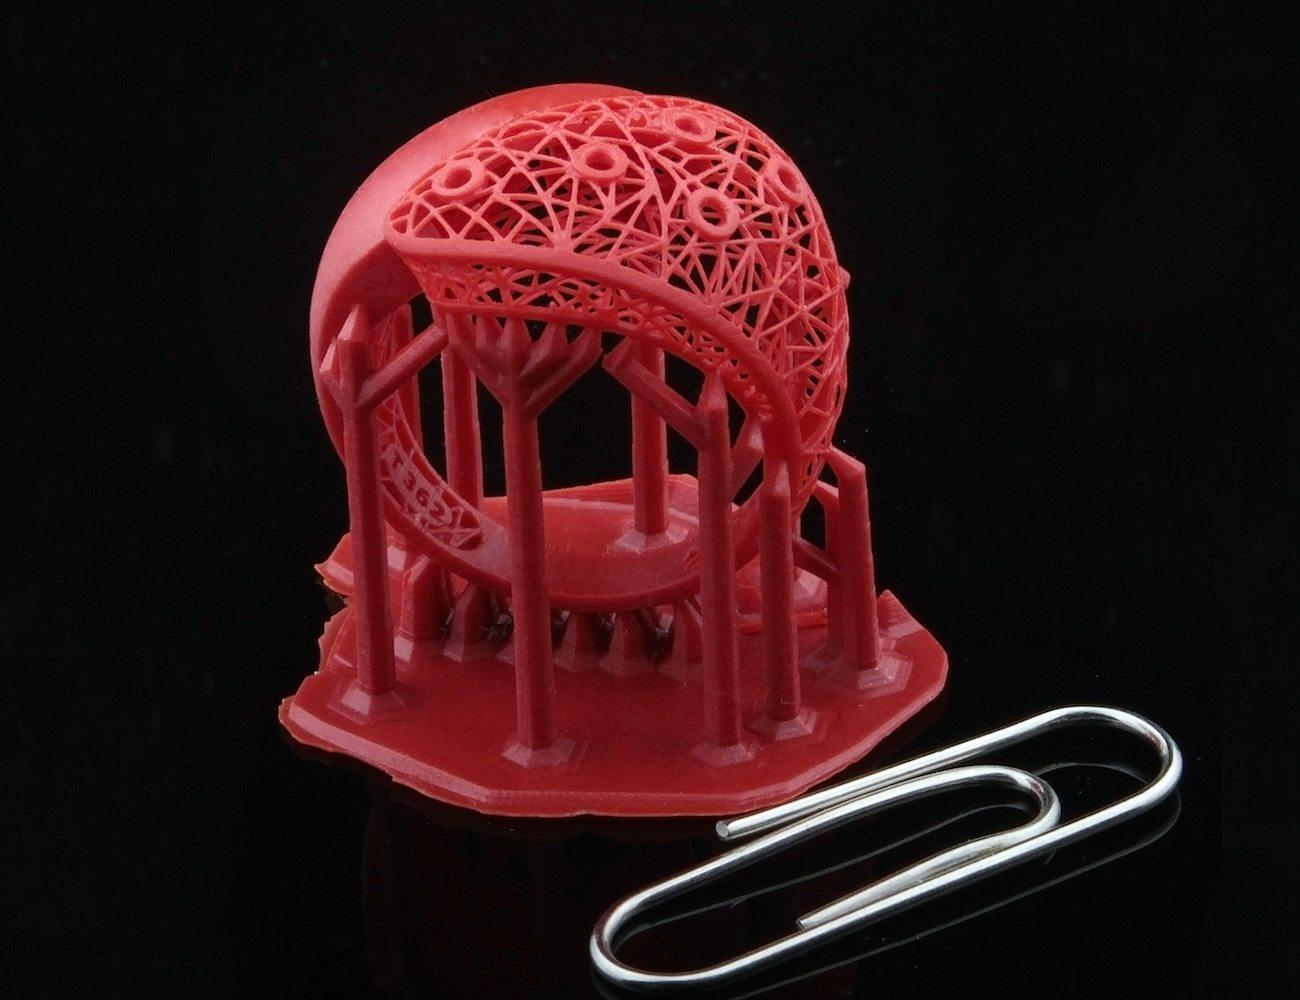 M-Jewelry – A Professional UV-LED, Wireless DLP 3D Printer